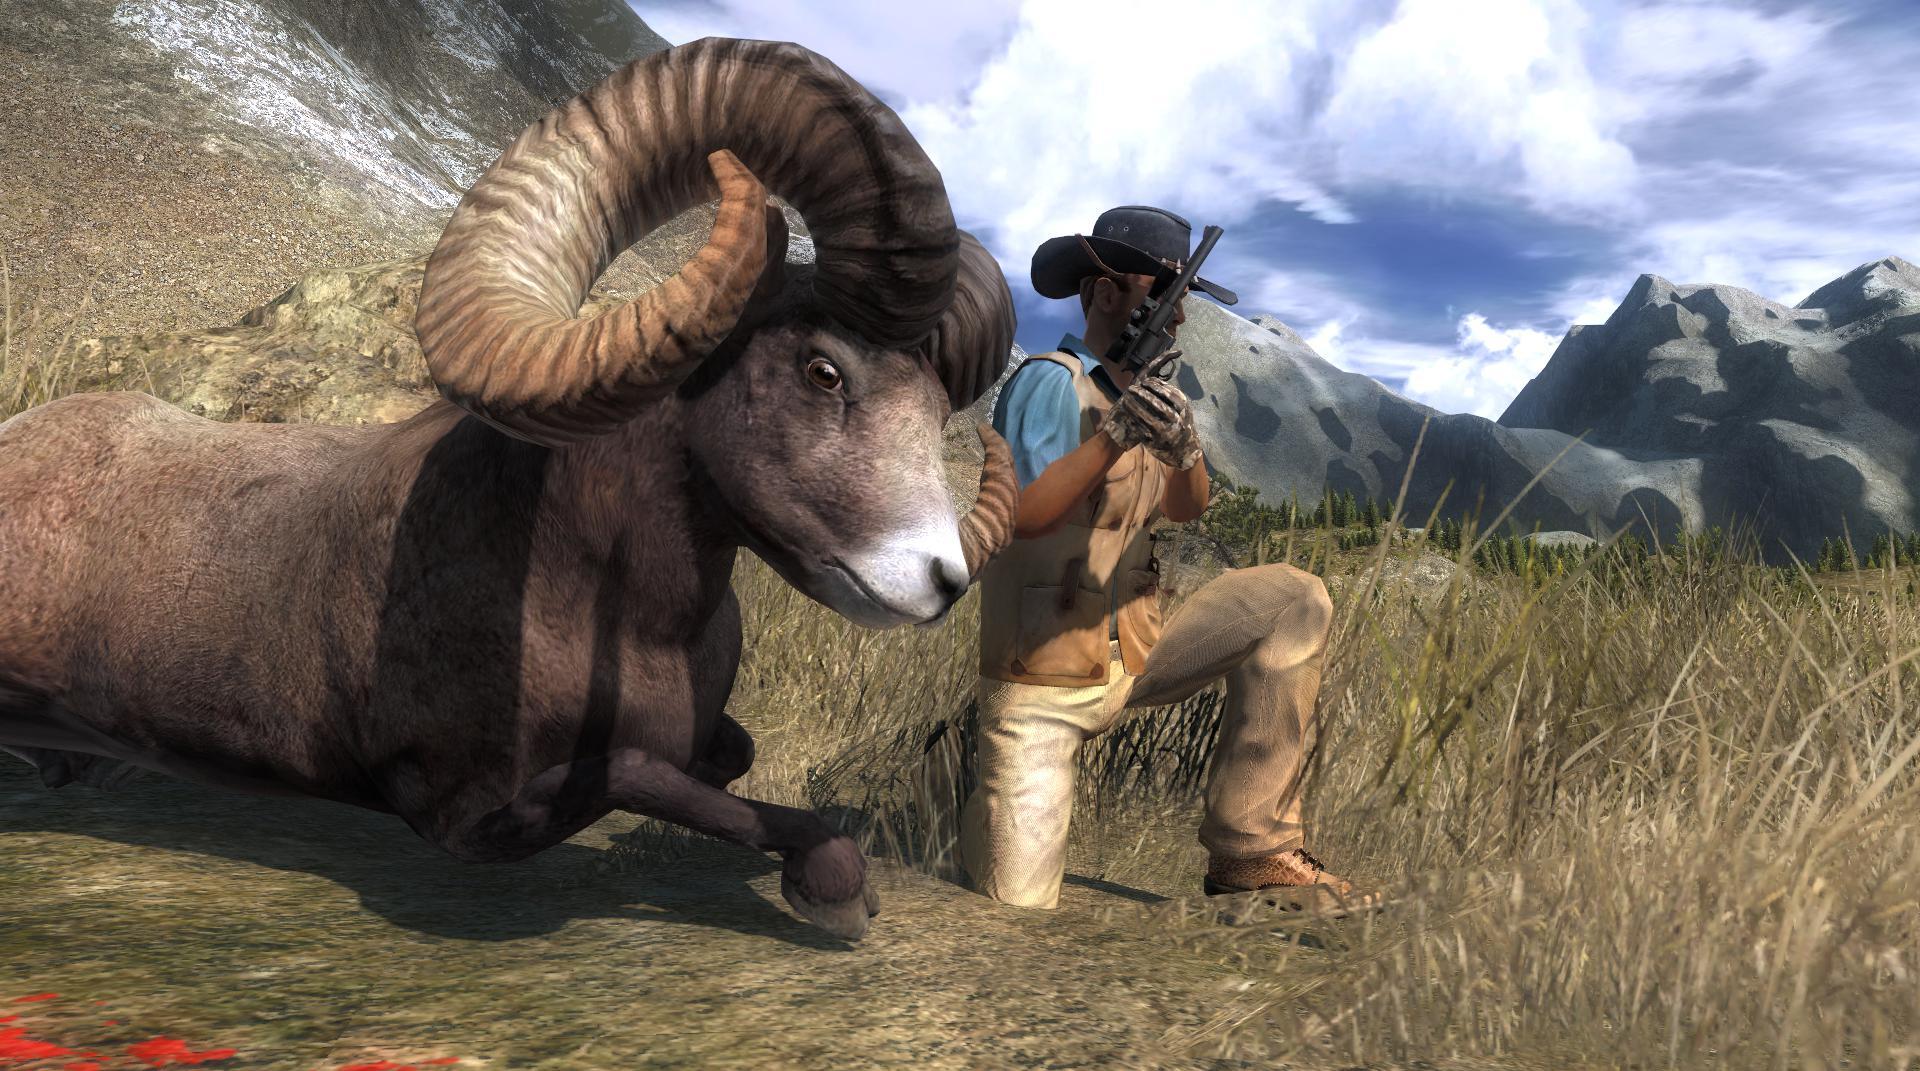 TOP 5 Bighorn Sheep // Muflón de las Rocosas 0876d22667c6fb2fd238eeac544c749b8e30b7fc